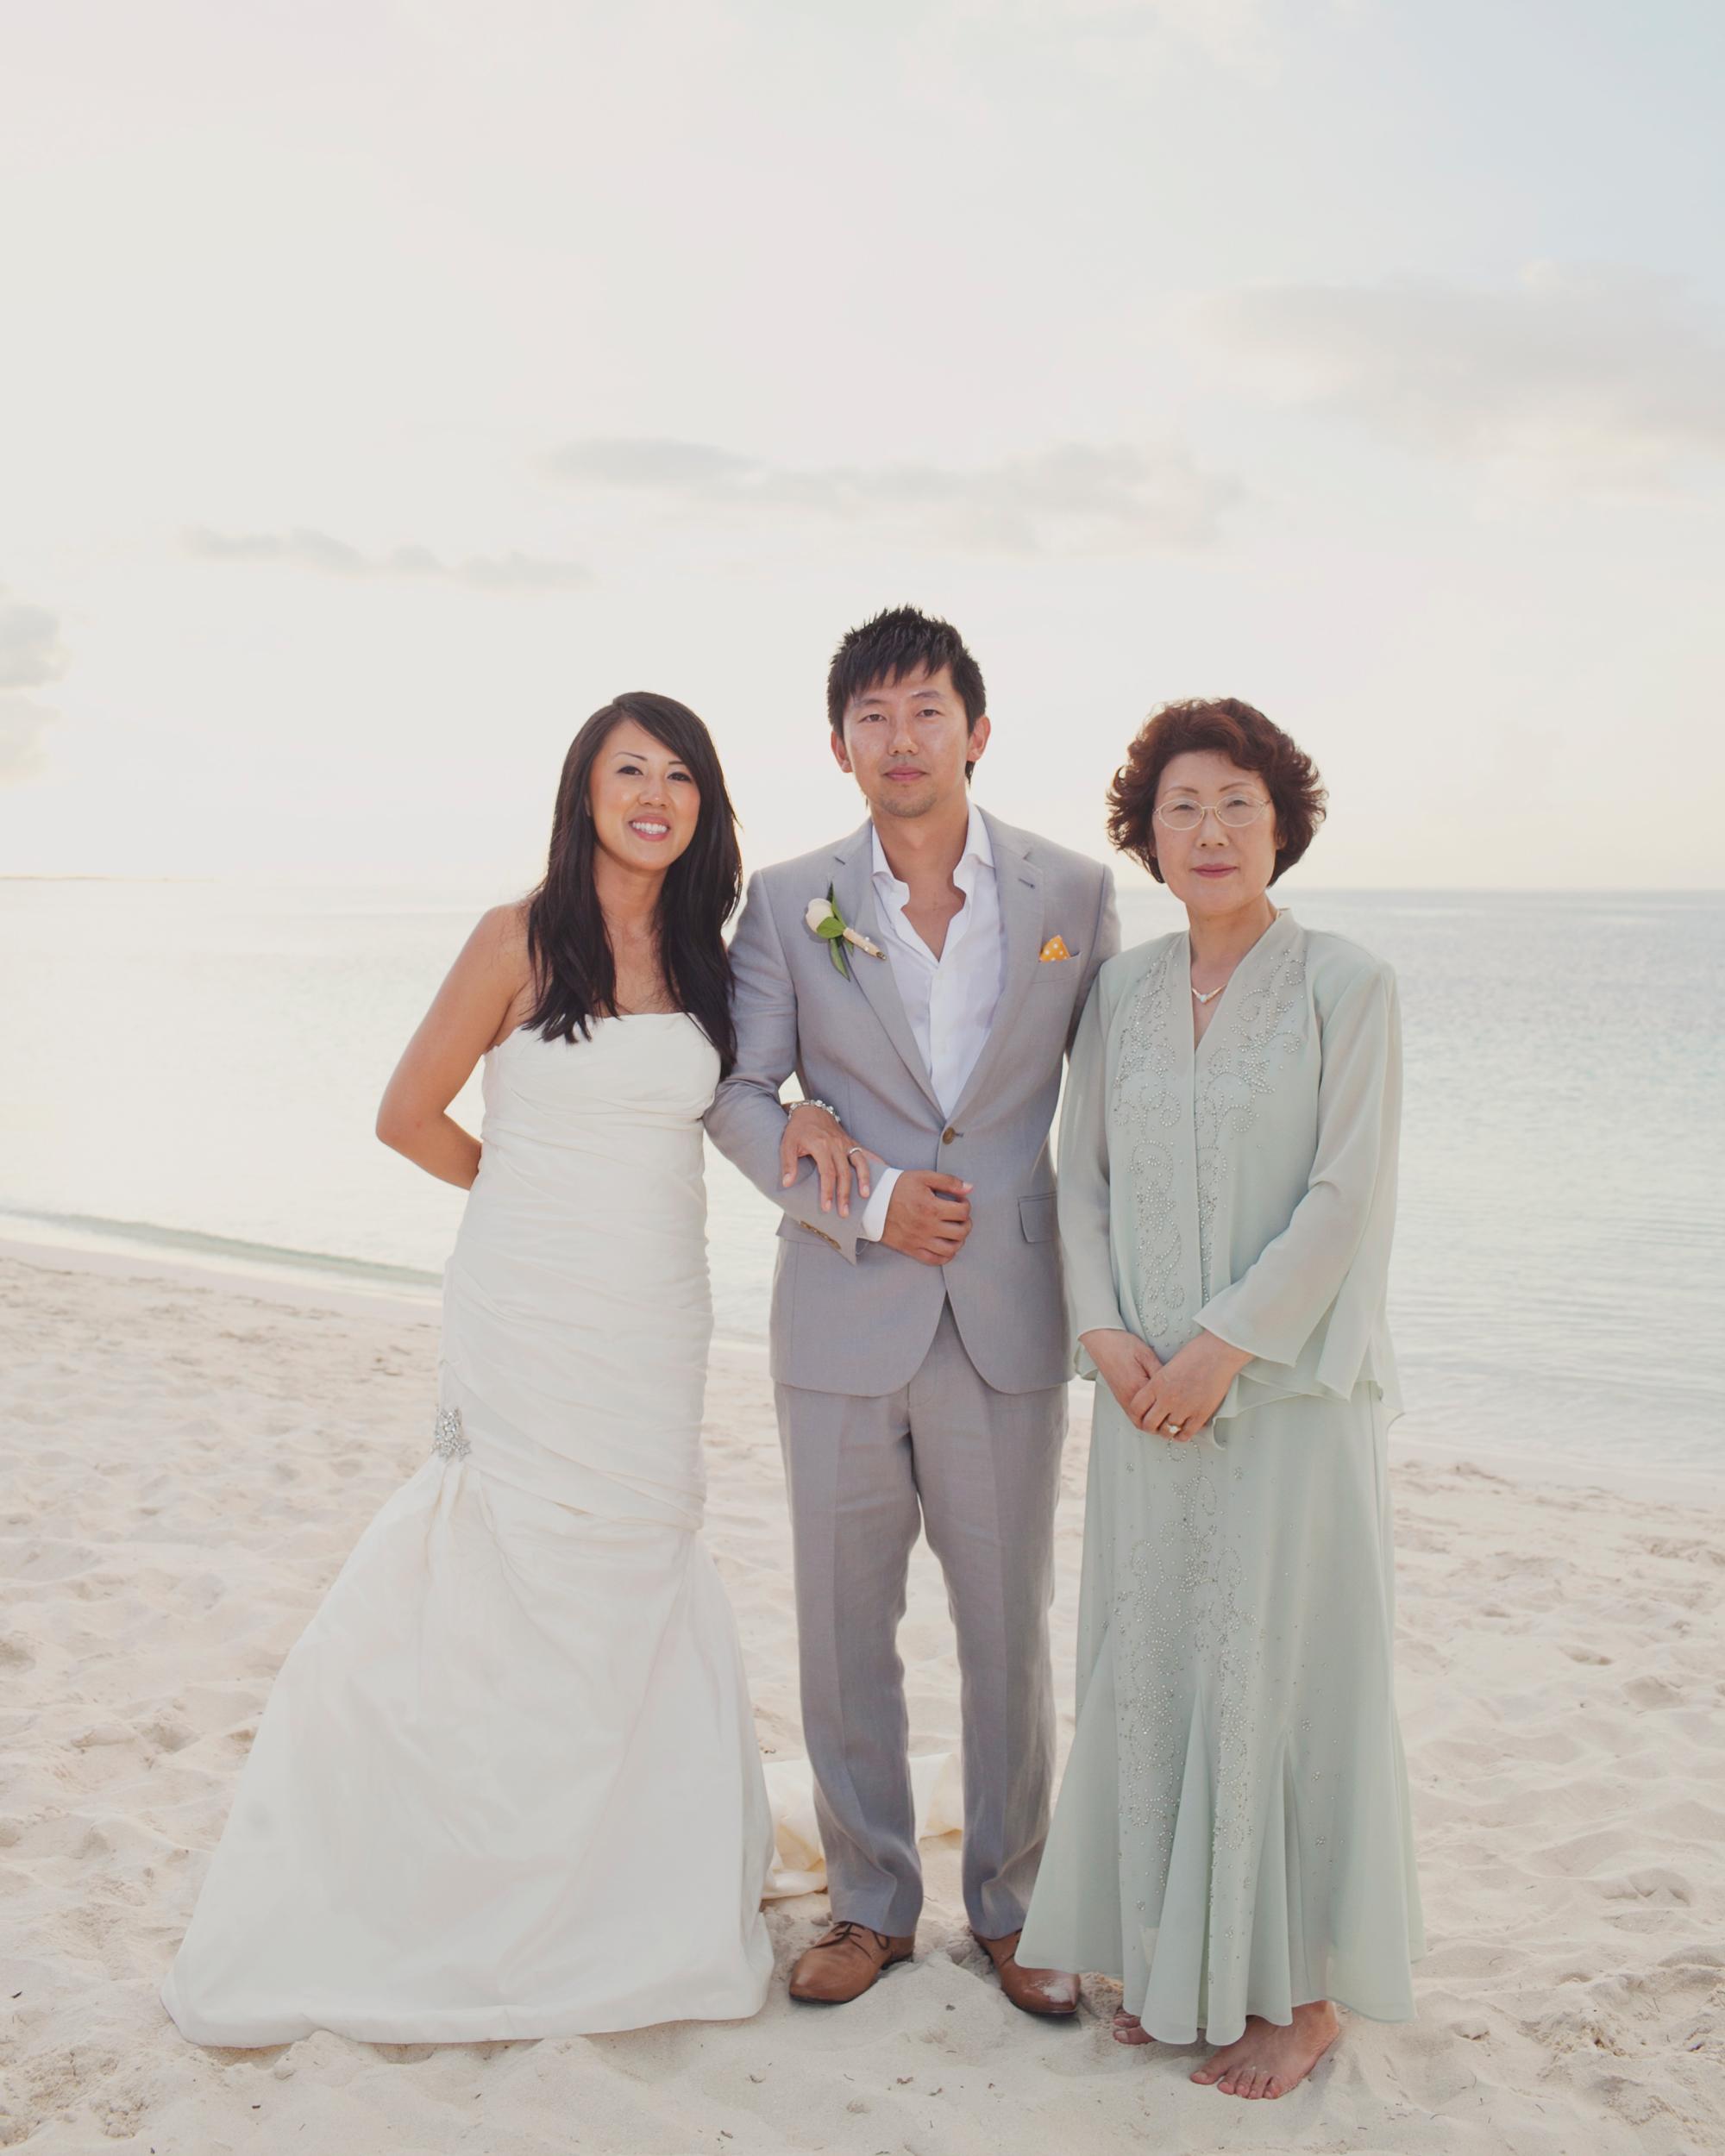 real-weddings-jessica-bobby-0811-1445.jpg